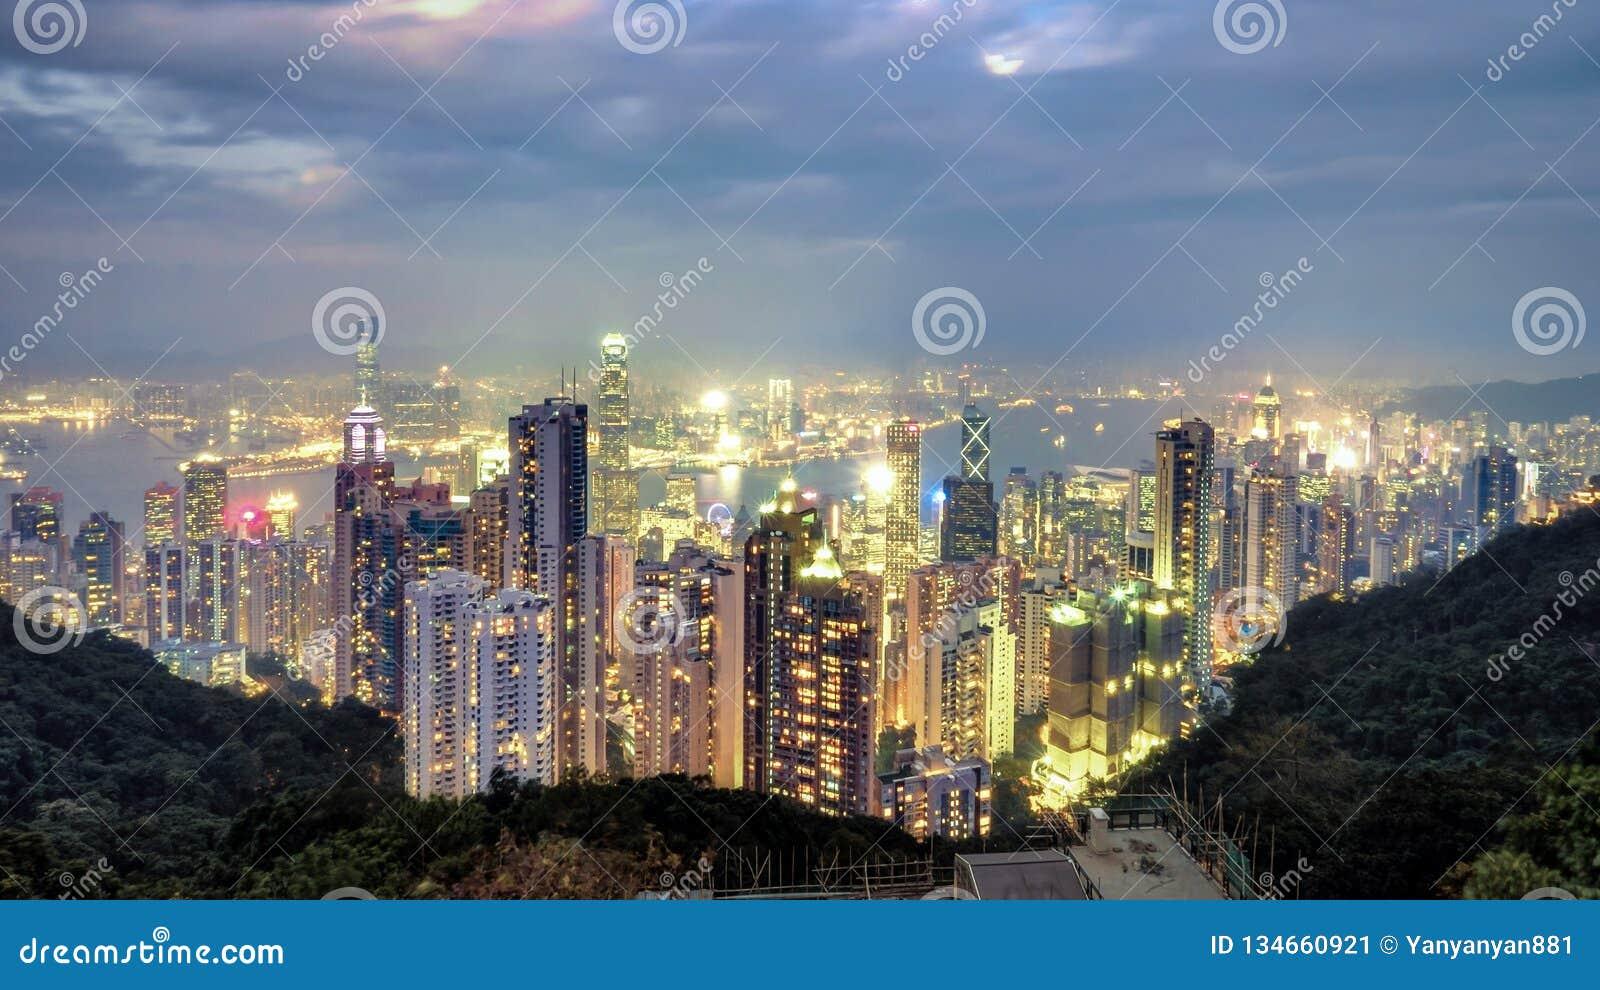 Night scene image of Hong Kong city skyline